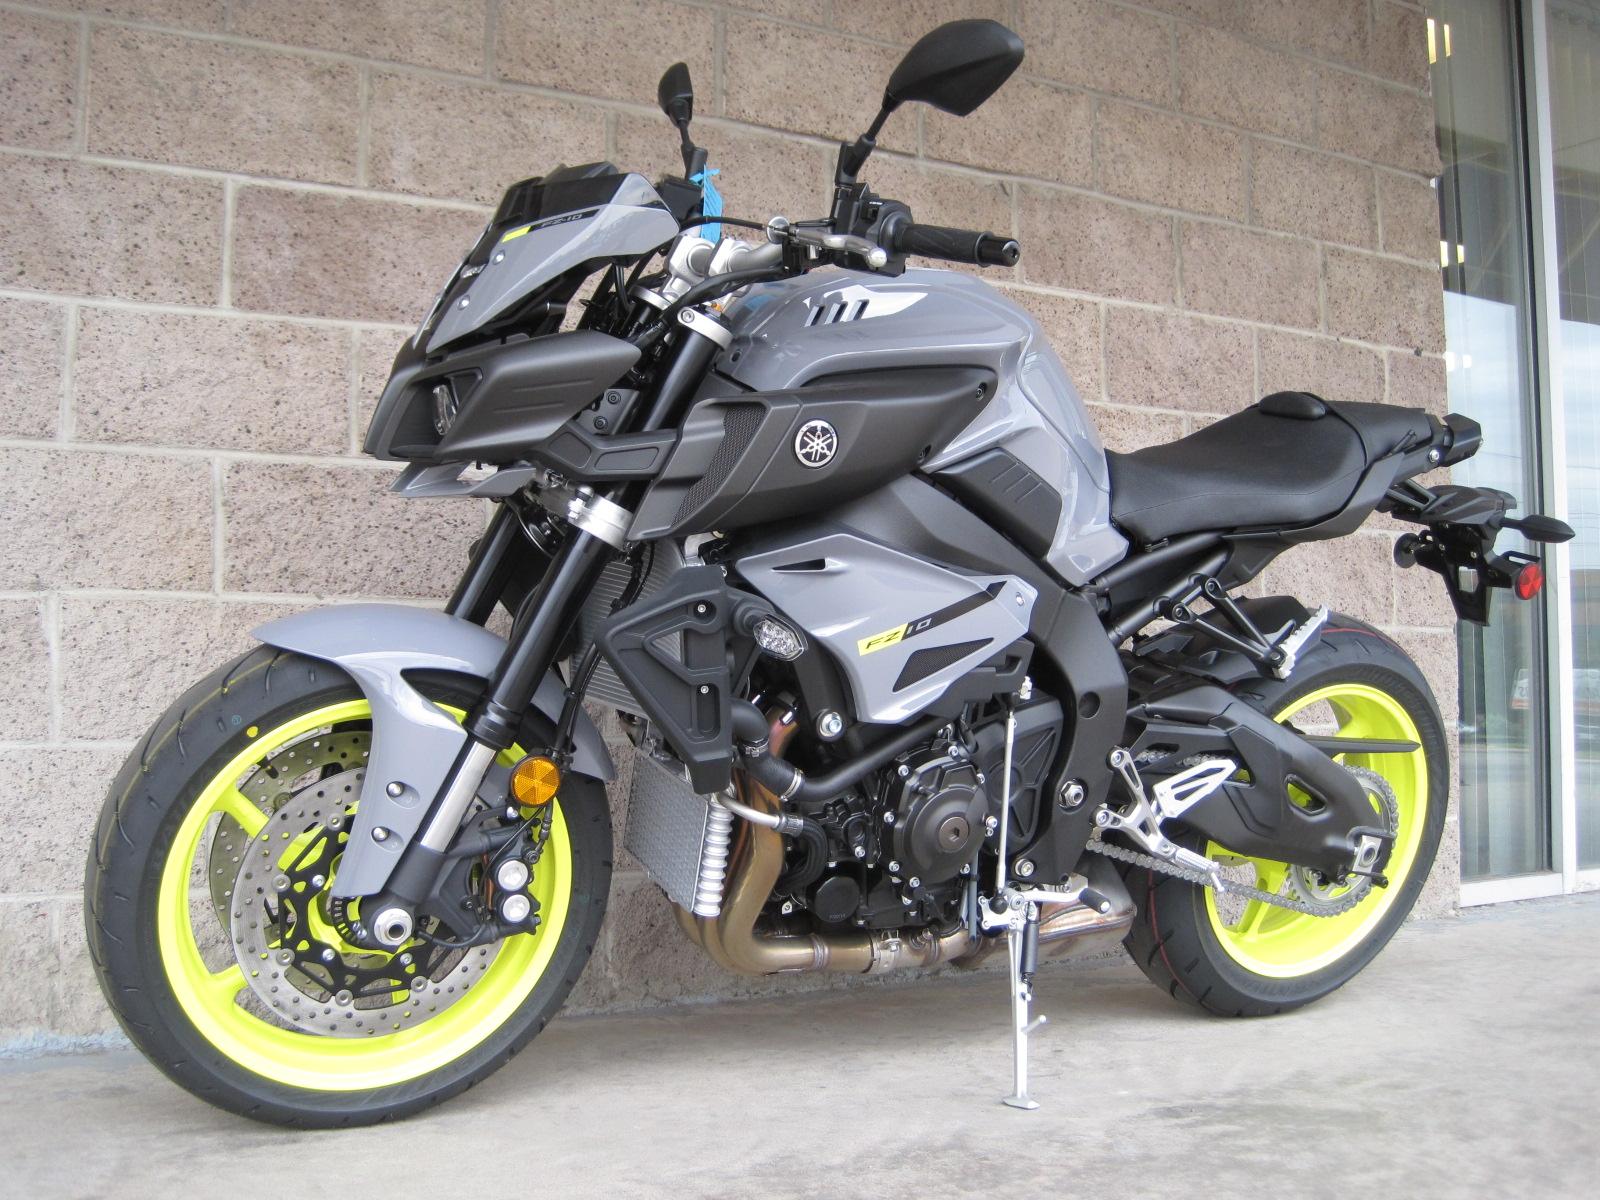 Wallpaper Yamaha Fz 10 Sportbikes 2017 Bikes Yamaha Hd: Colorado's Favorite Motorcycle Shop